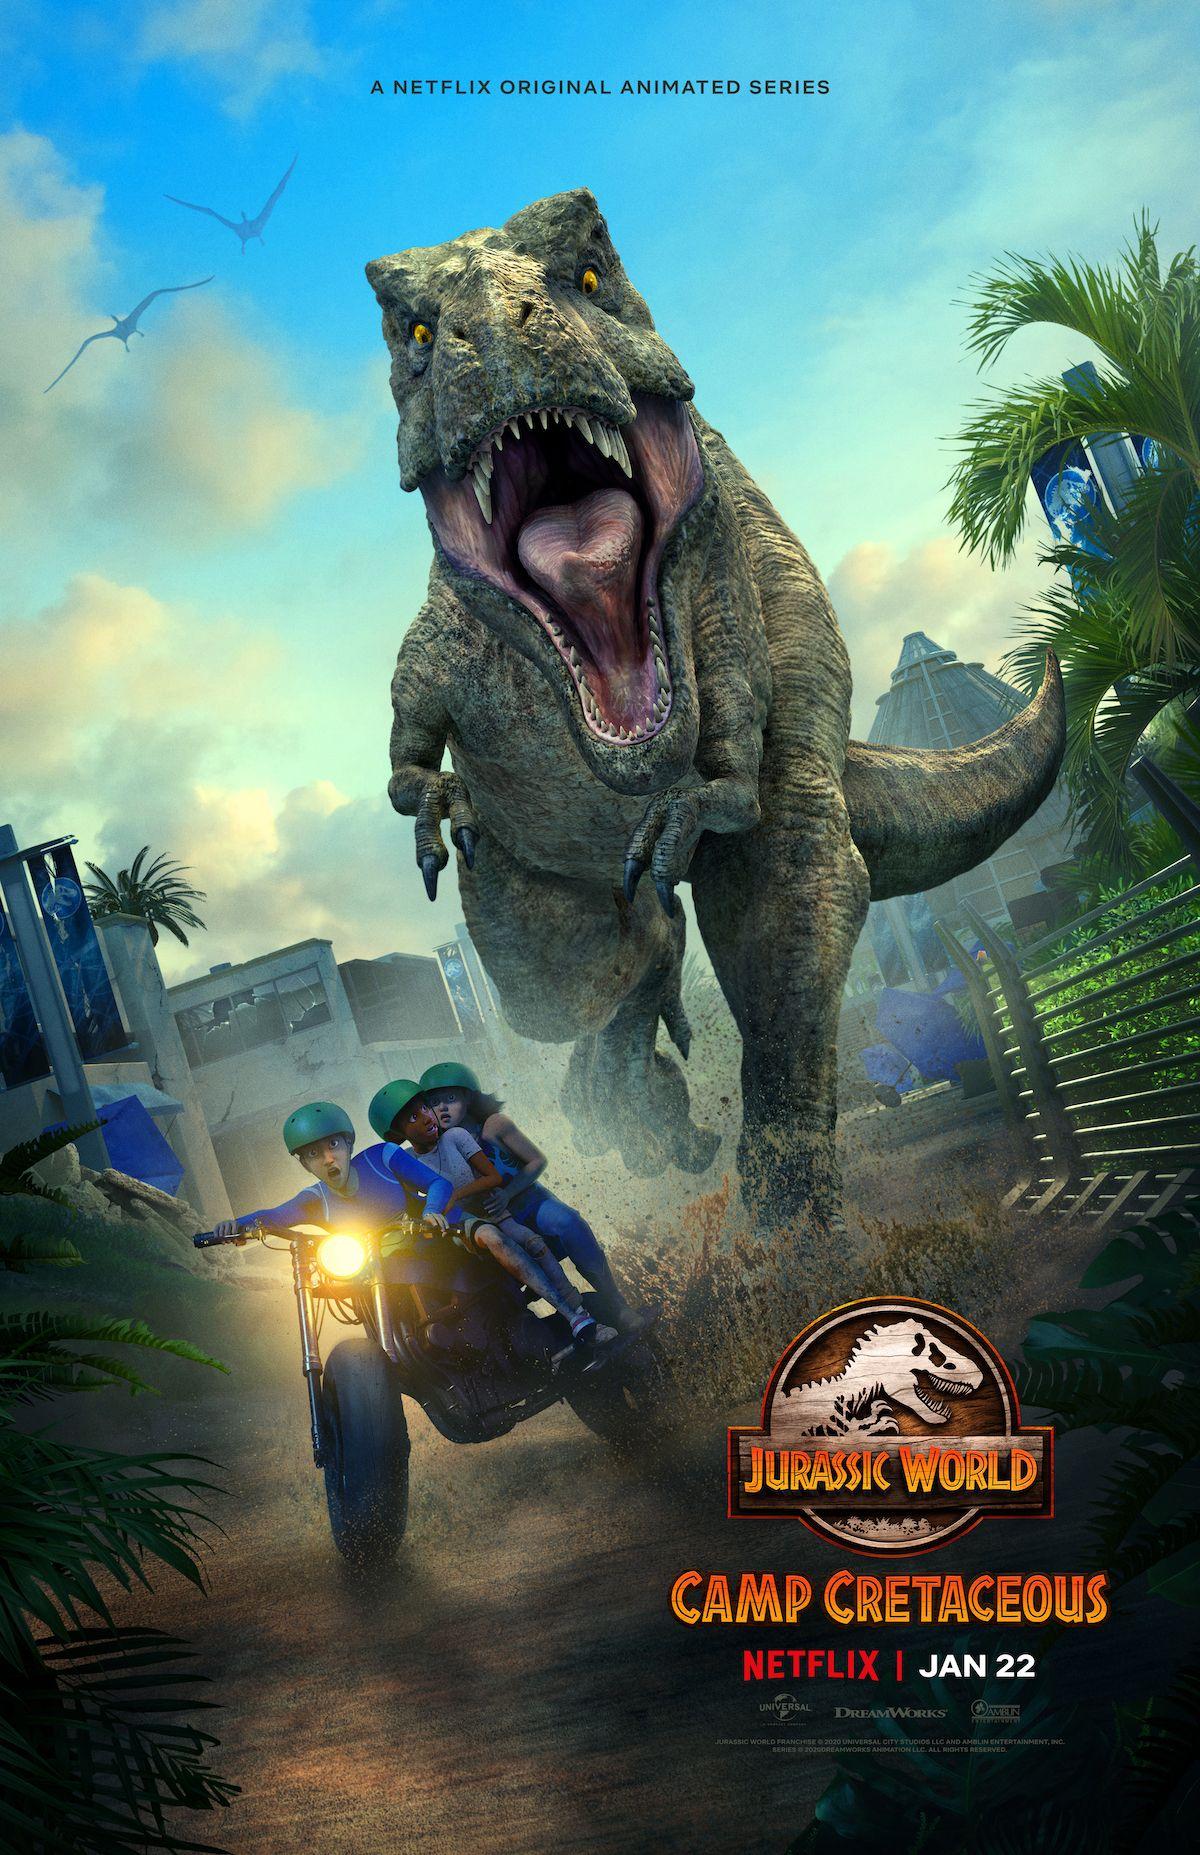 Jurassic World : Camp Cretaceous Season 2 (2021) จูราสสิค เวิลด์ ค่ายครีเทเซียส ภาค2 พากย์ไทย EP1-EP8 [จบ]